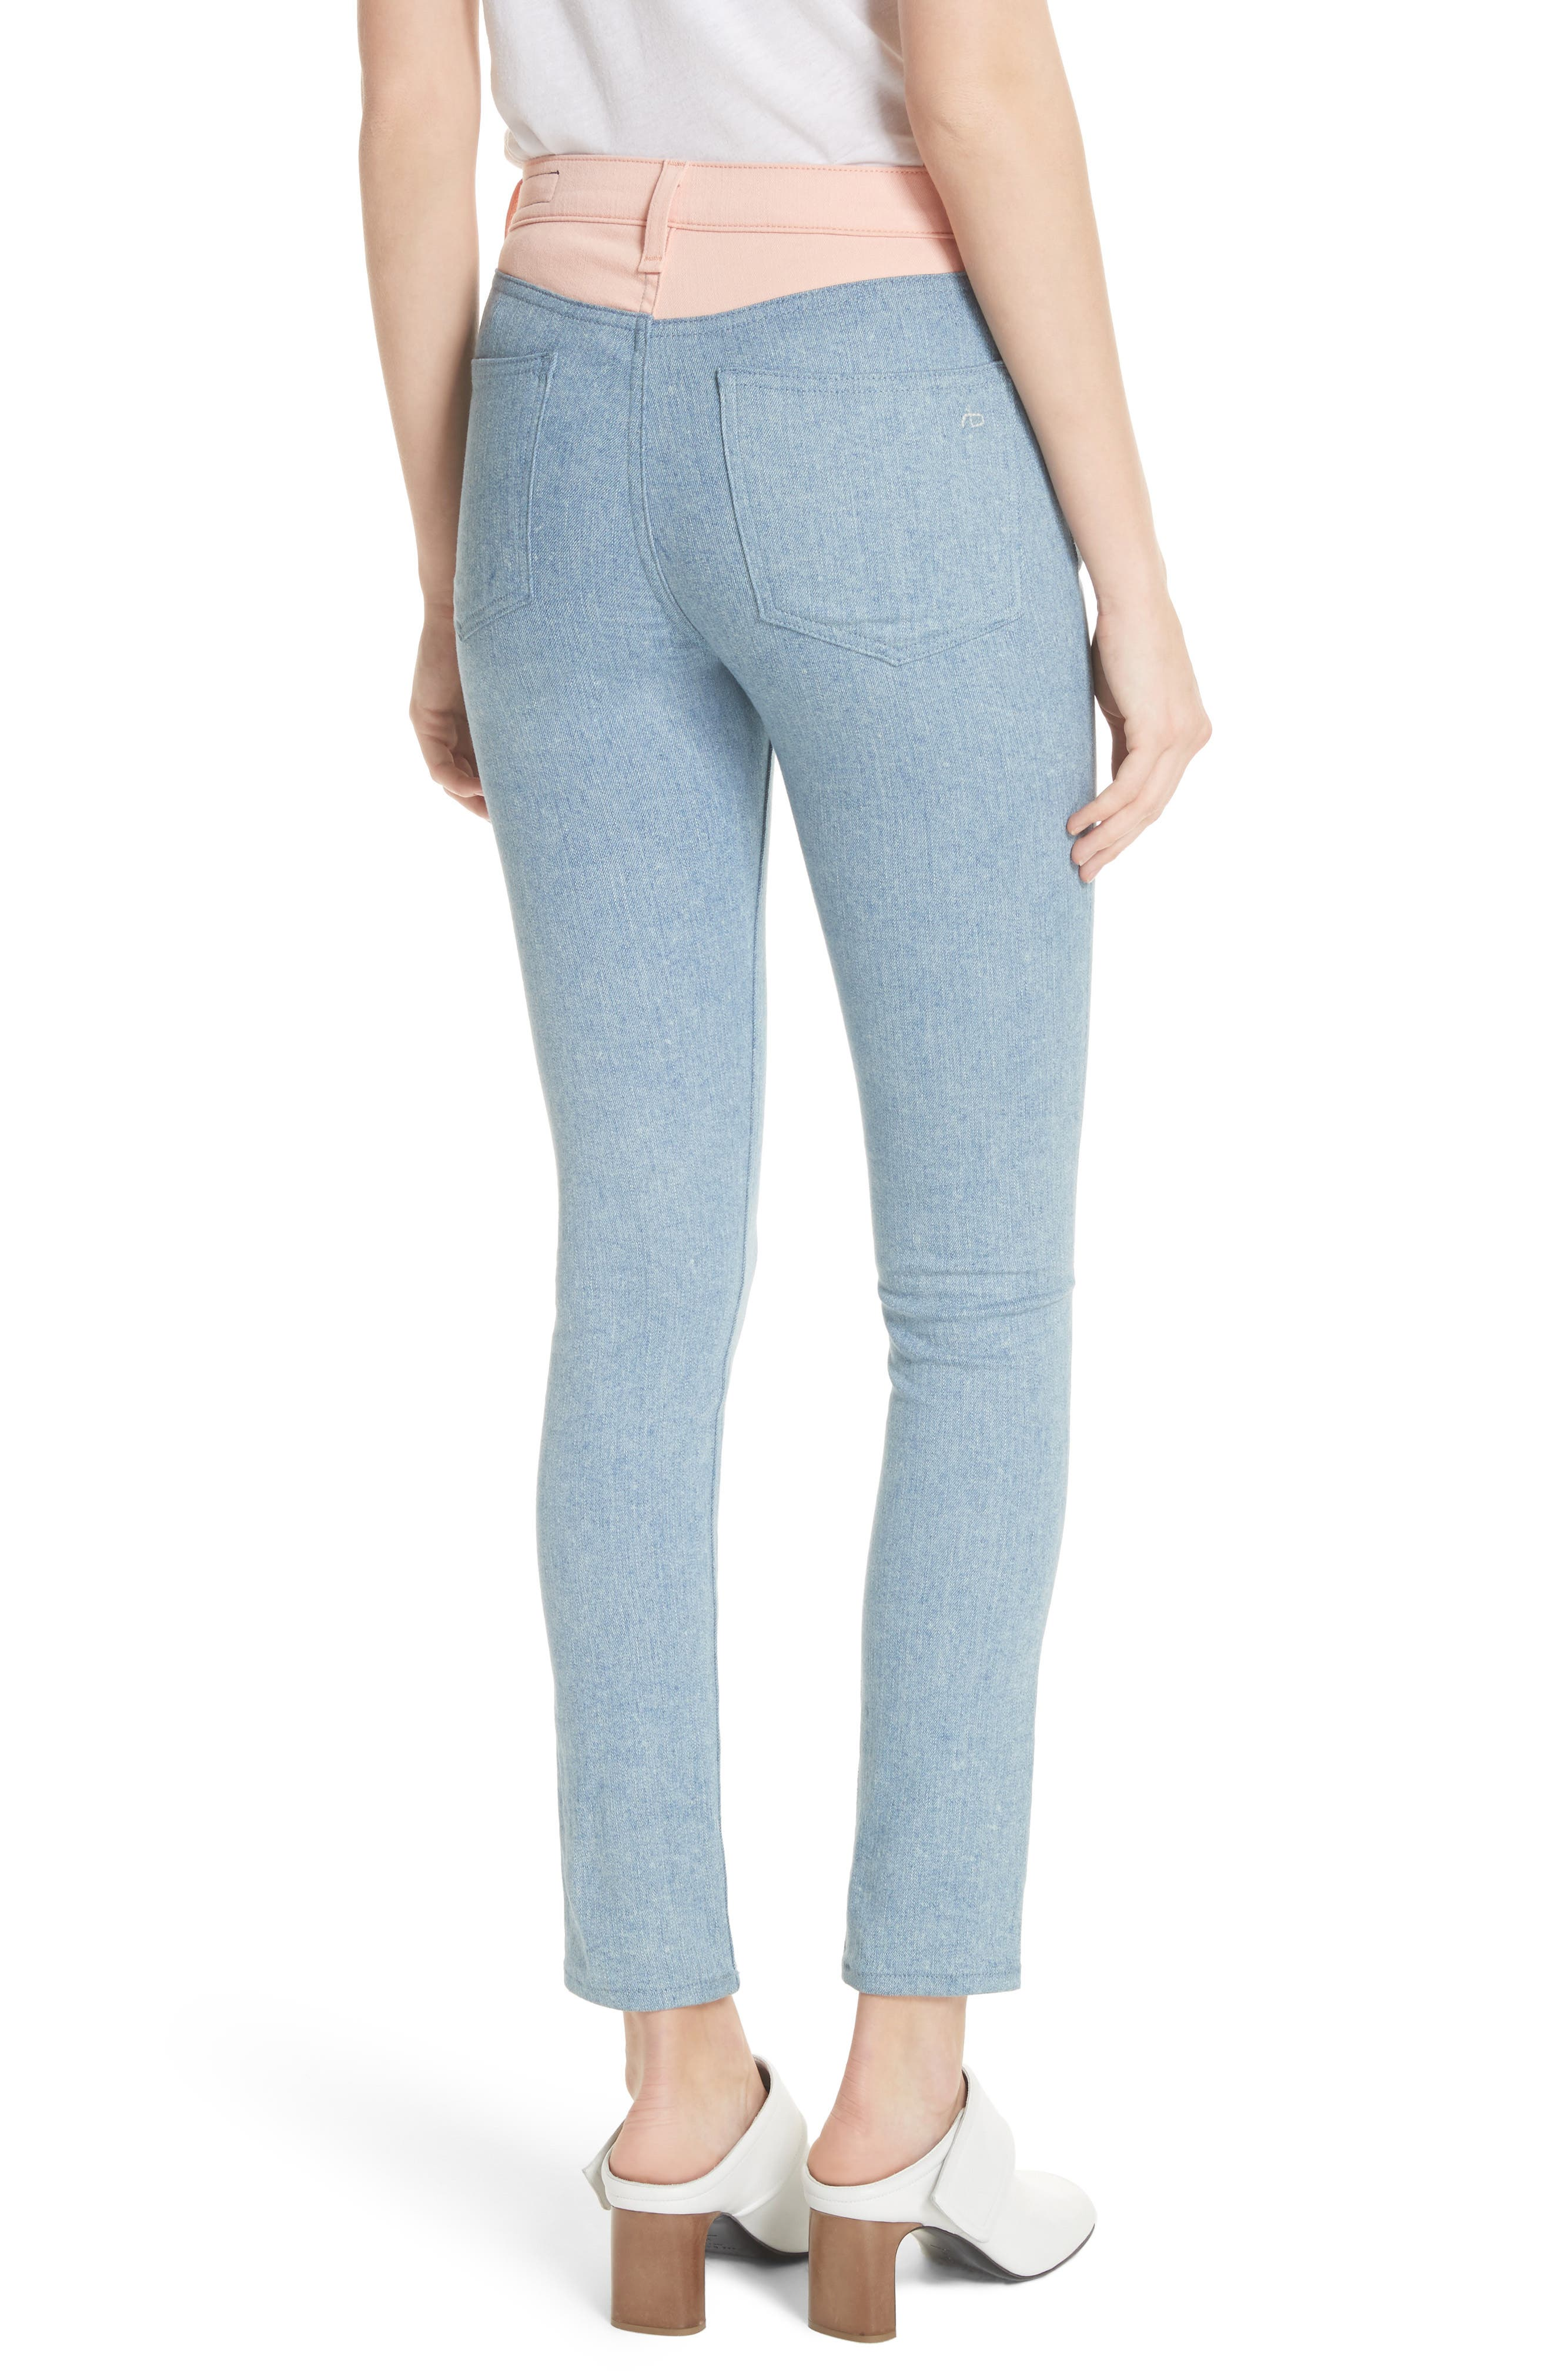 Phila Skinny Jeans,                             Alternate thumbnail 2, color,                             Nelly/ Prairie